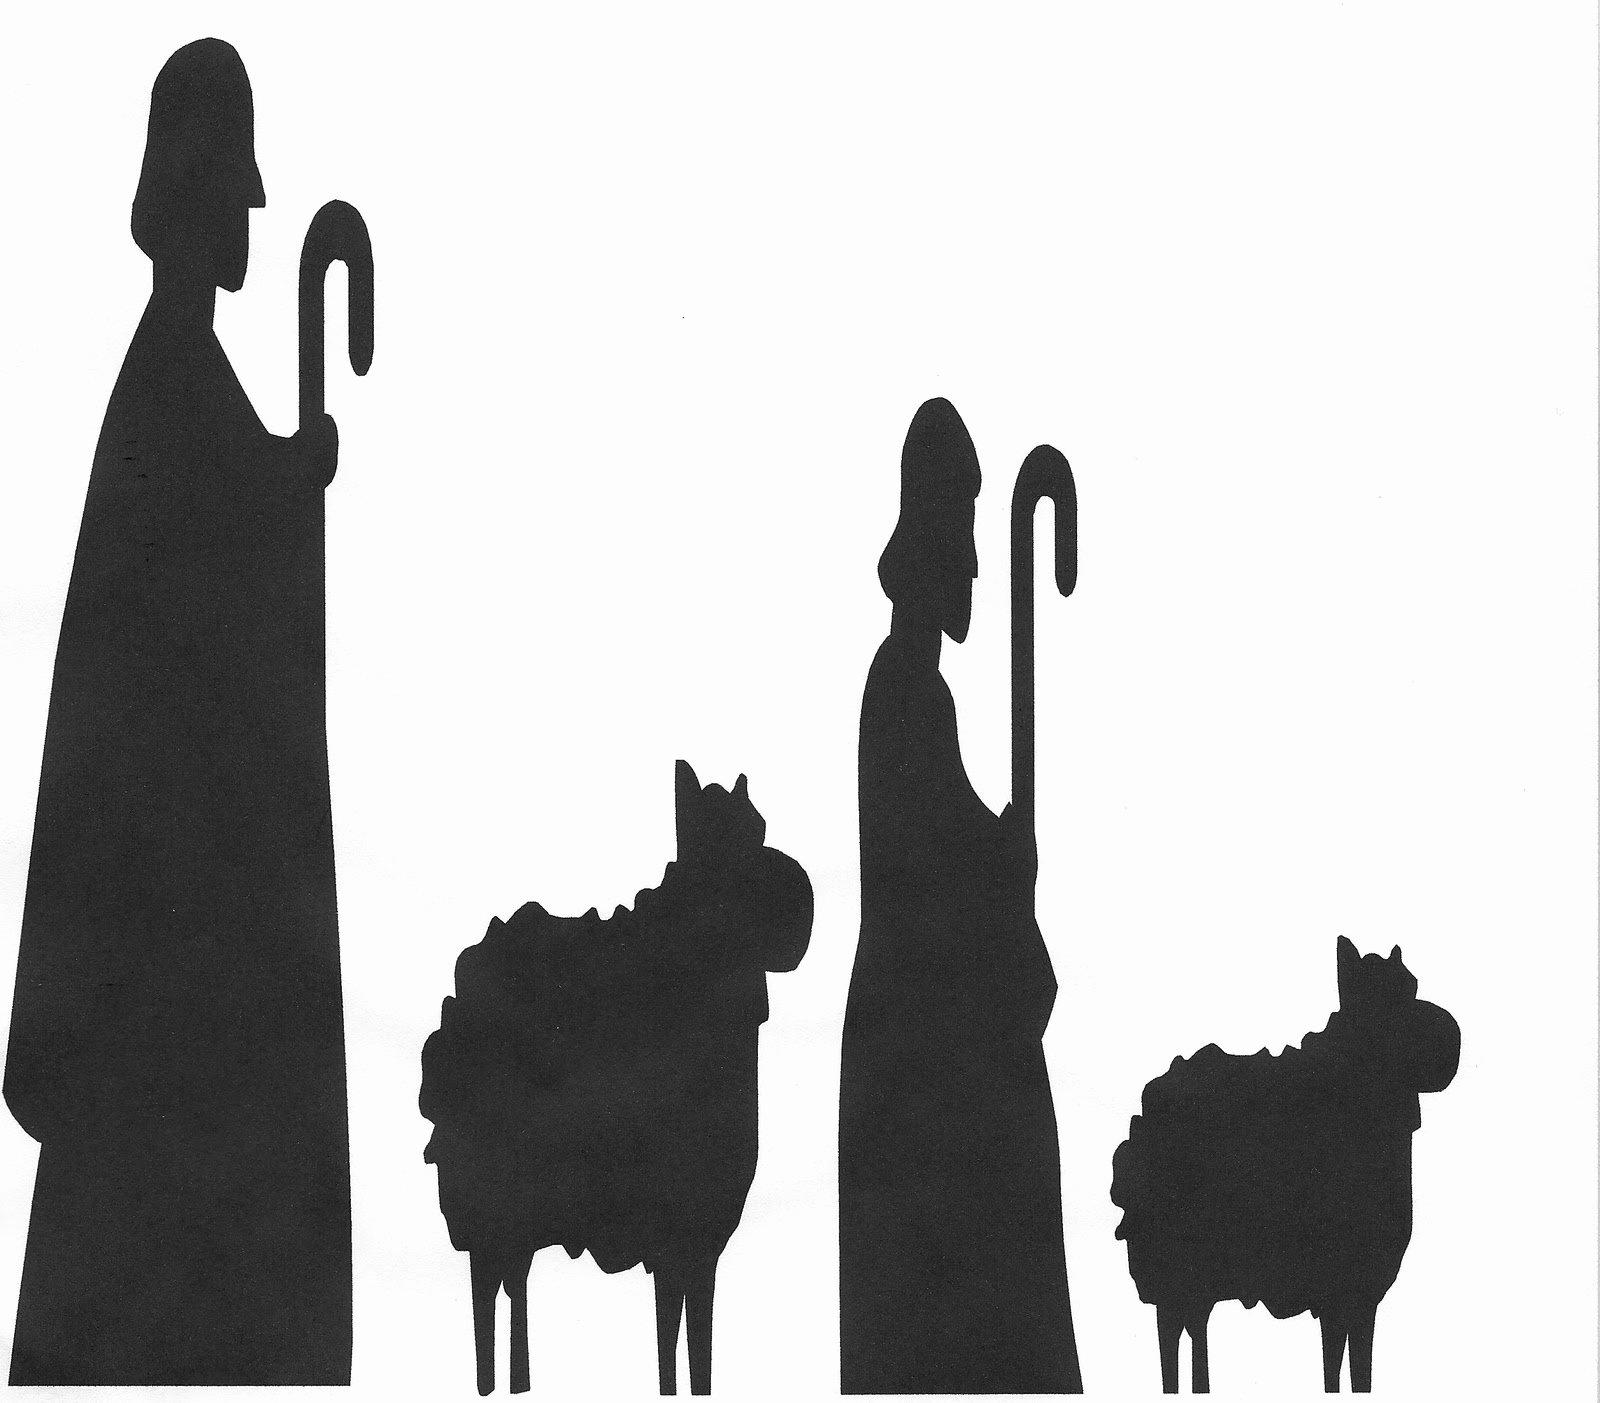 Nativity Scene Silhouette Pattern Free Elegant Nativity Silhouette Patterns Cliparts